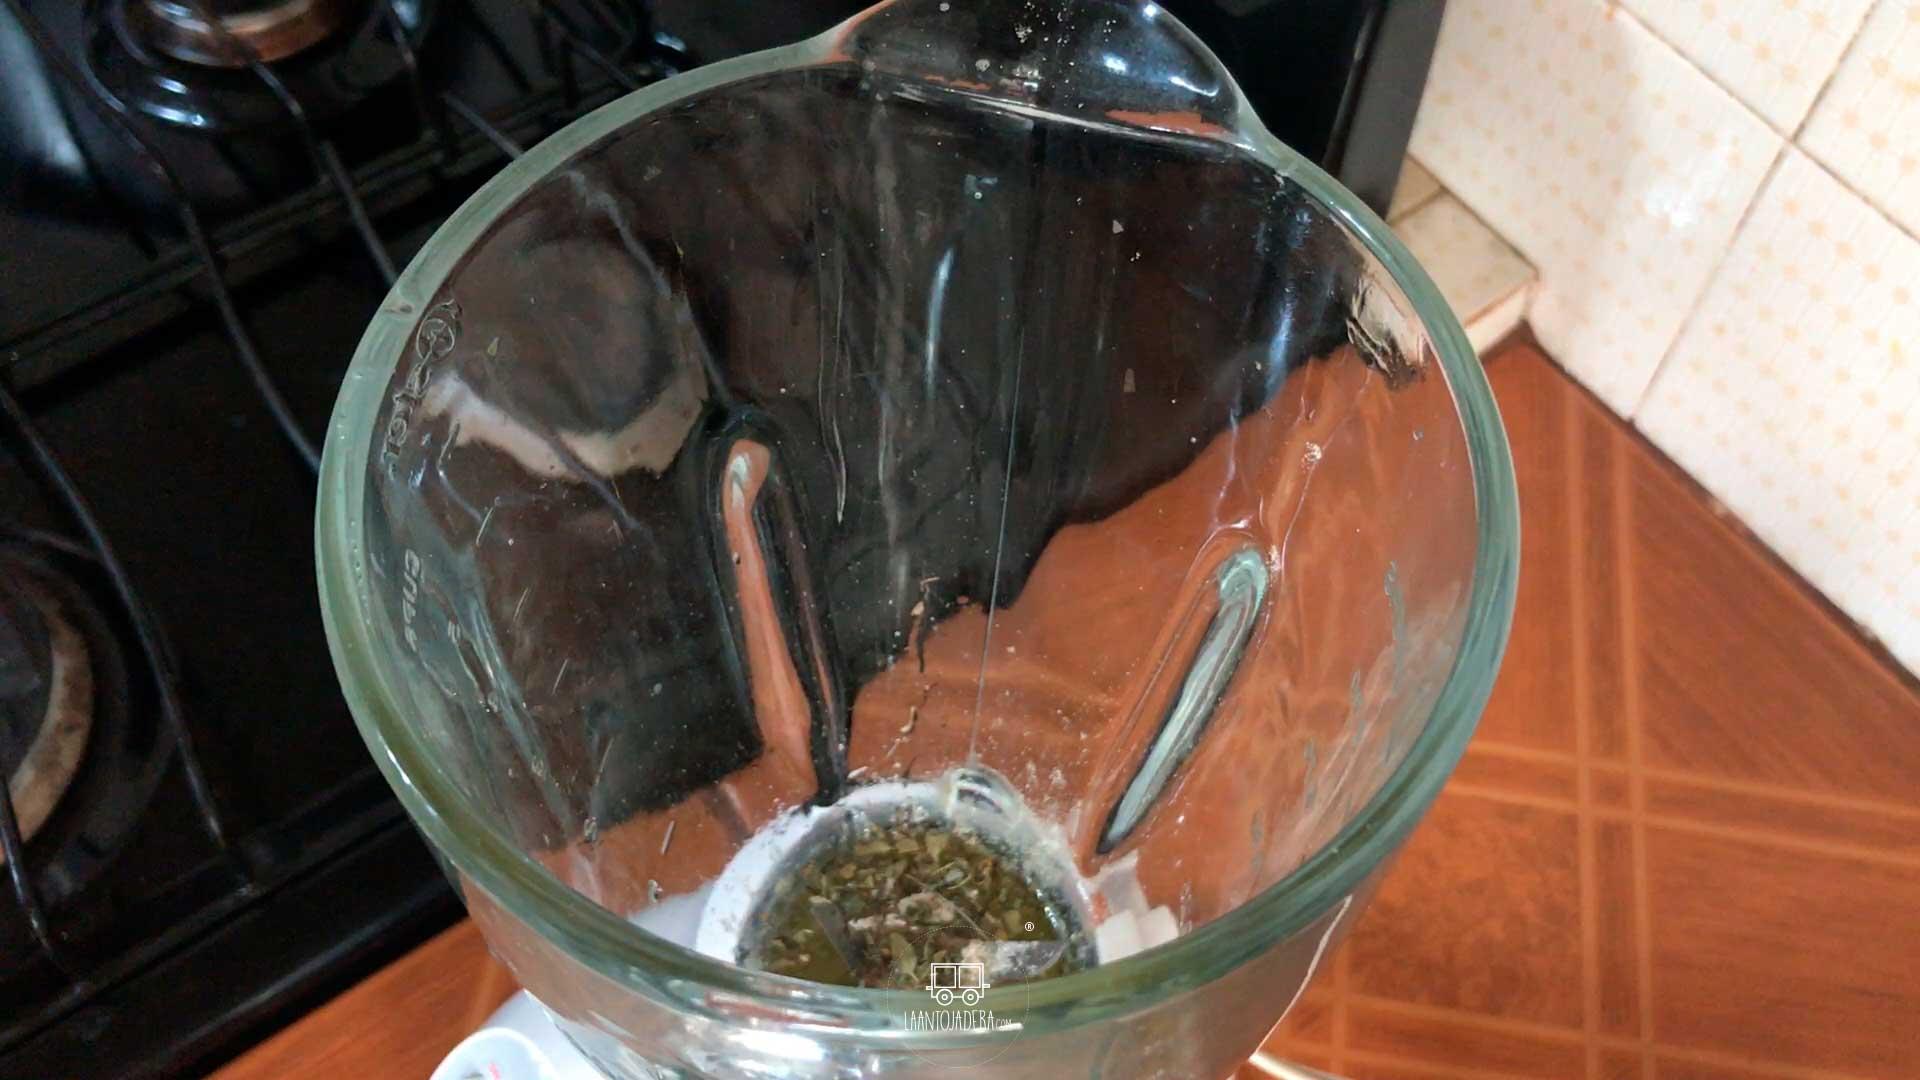 La Antojadera | Chuleta de Cerdo en Salsa Chipotle con Salsa de Perejil